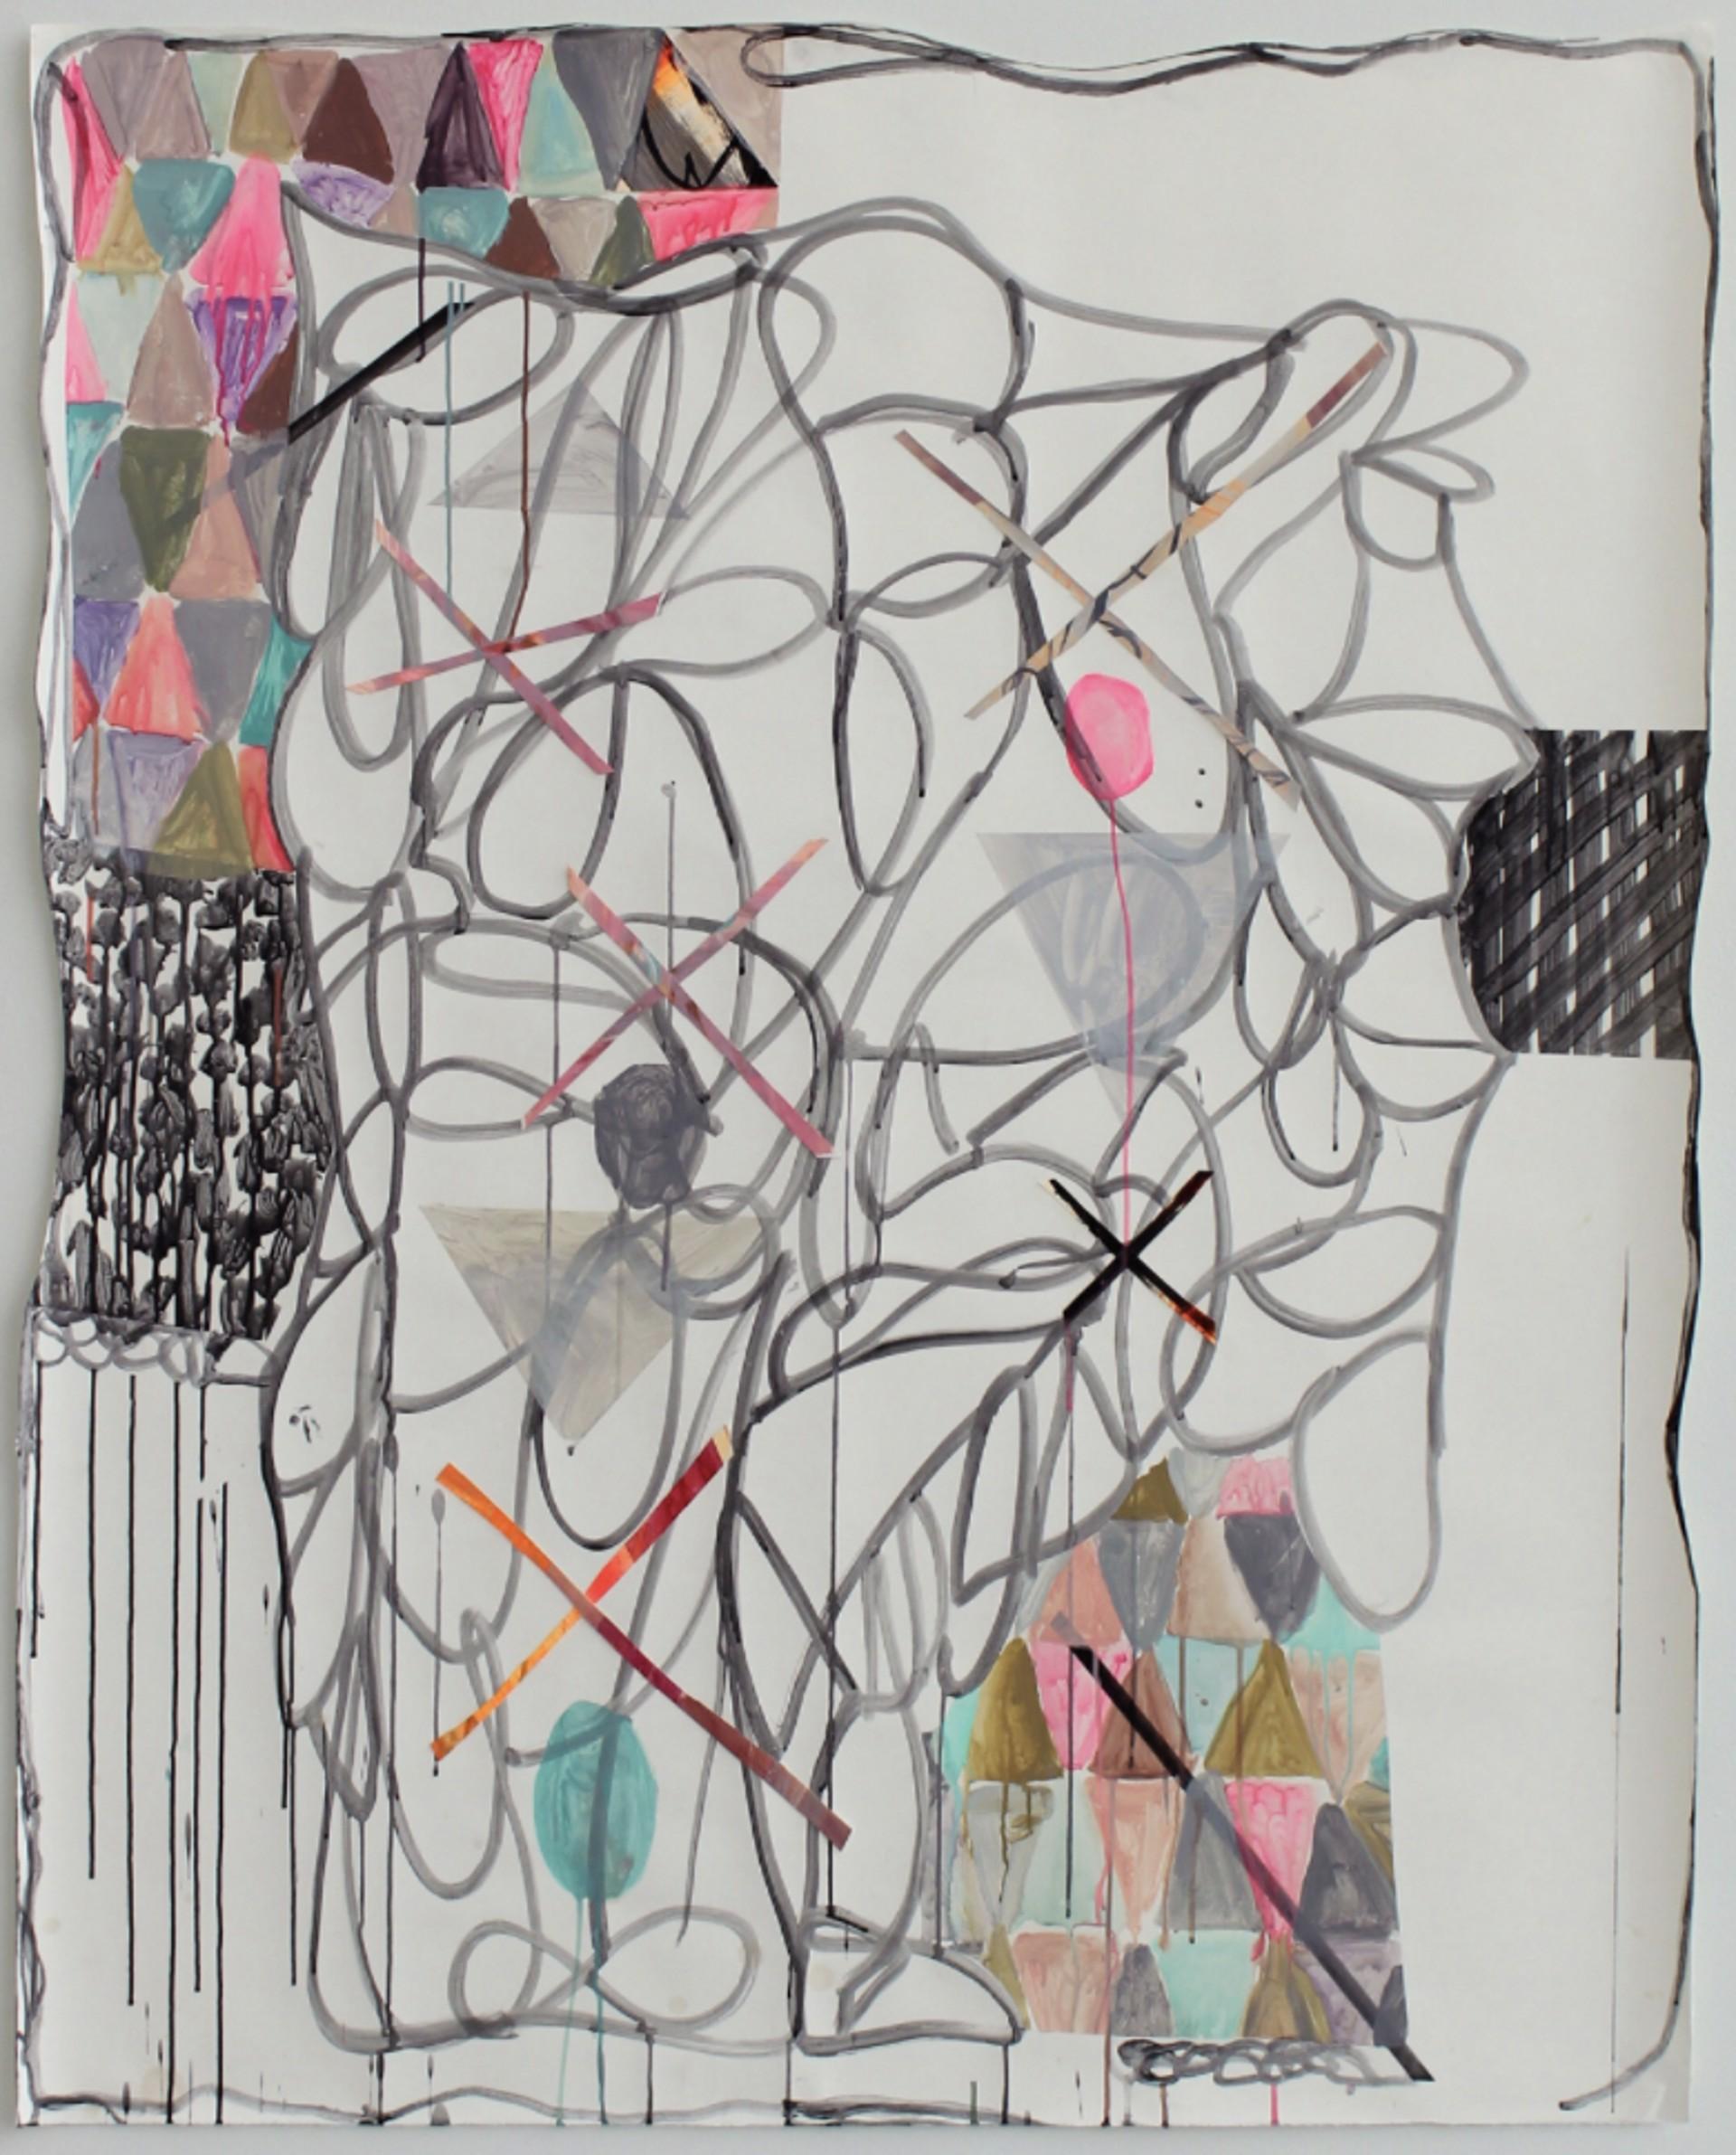 Lauren Rice - The Maze by Visiting Artist